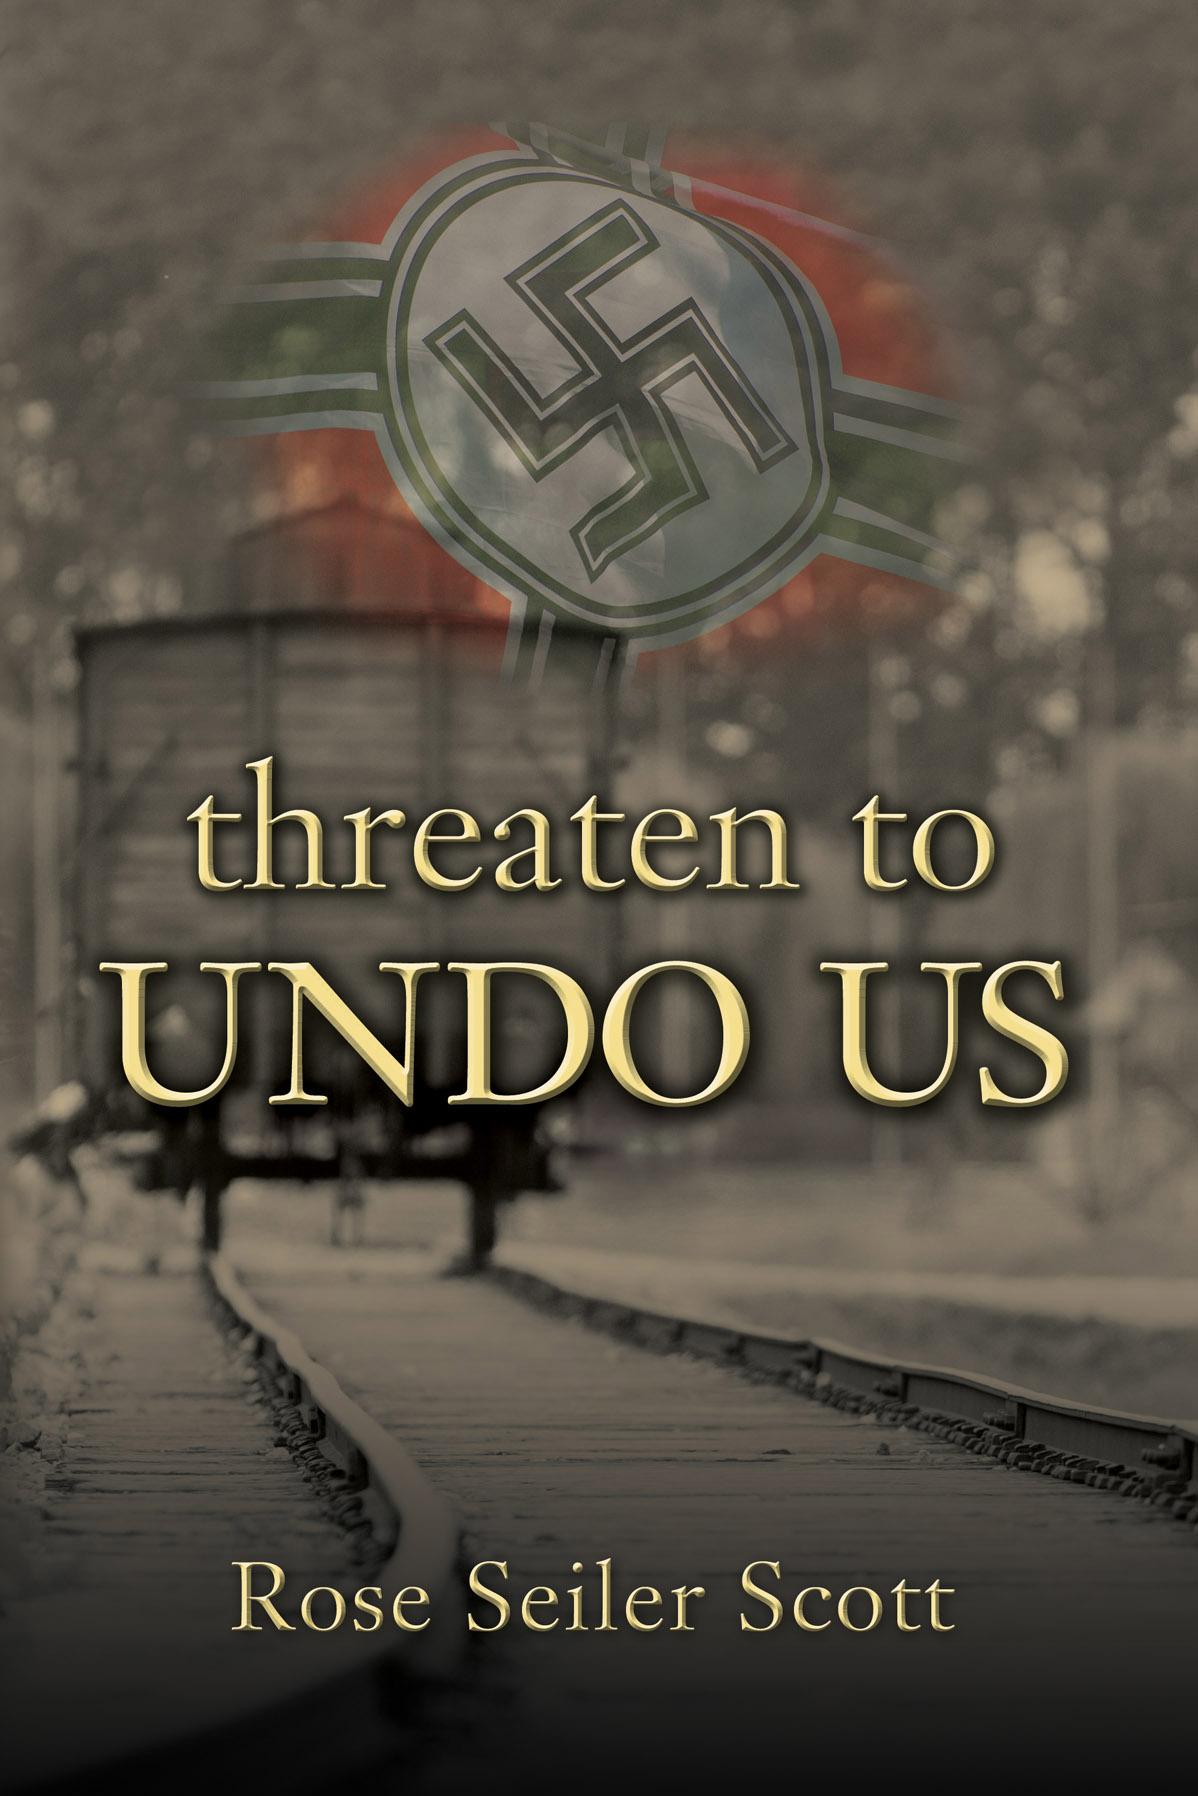 Threaten To Undo Us - Copy - Copy